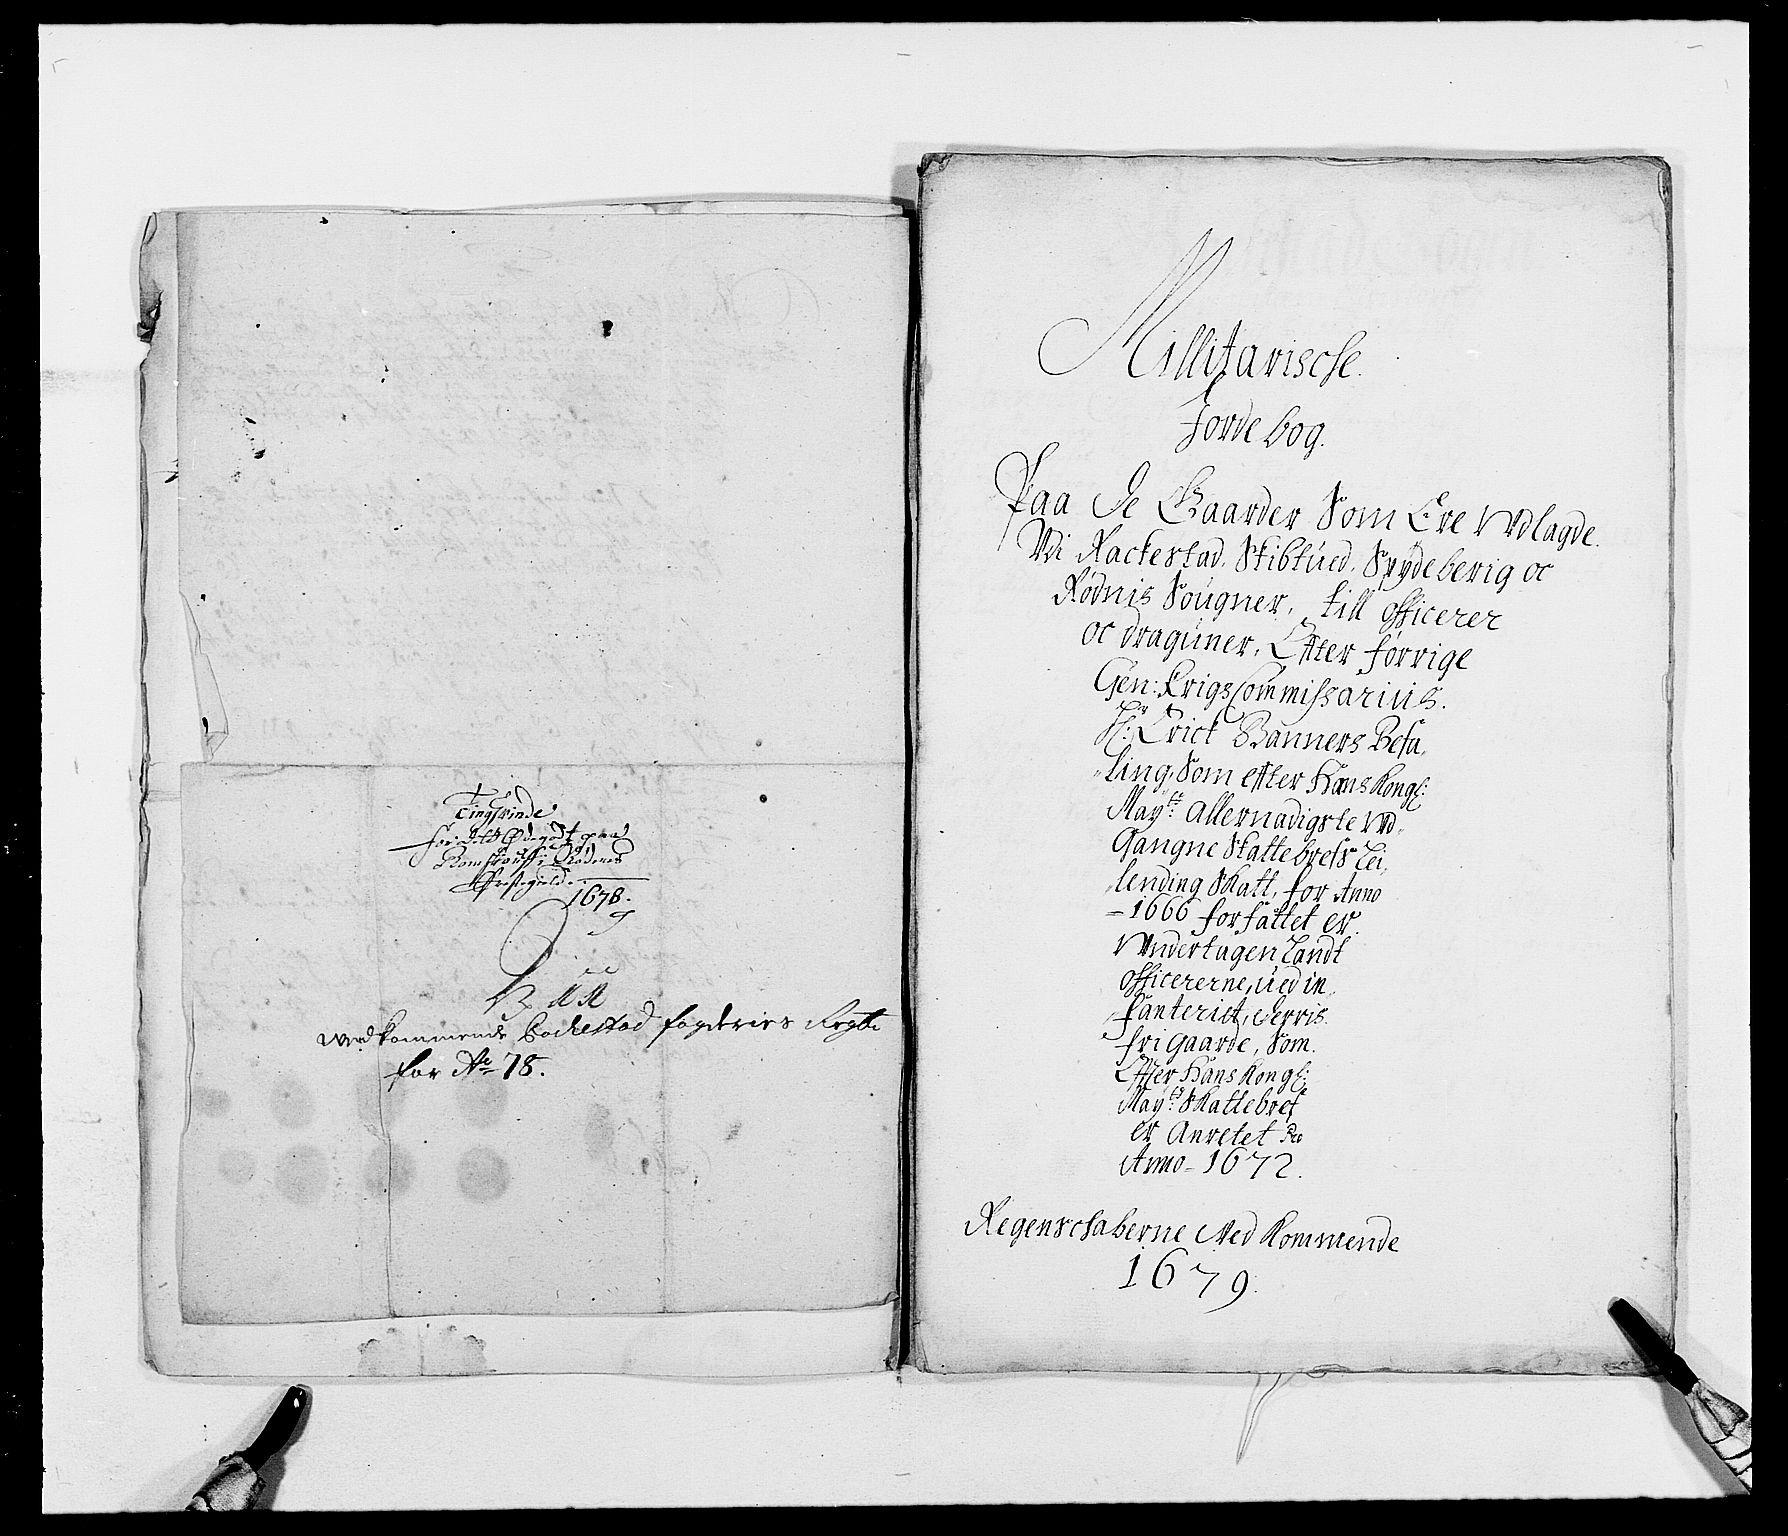 RA, Rentekammeret inntil 1814, Reviderte regnskaper, Fogderegnskap, R05/L0271: Fogderegnskap Rakkestad, 1678-1679, s. 528